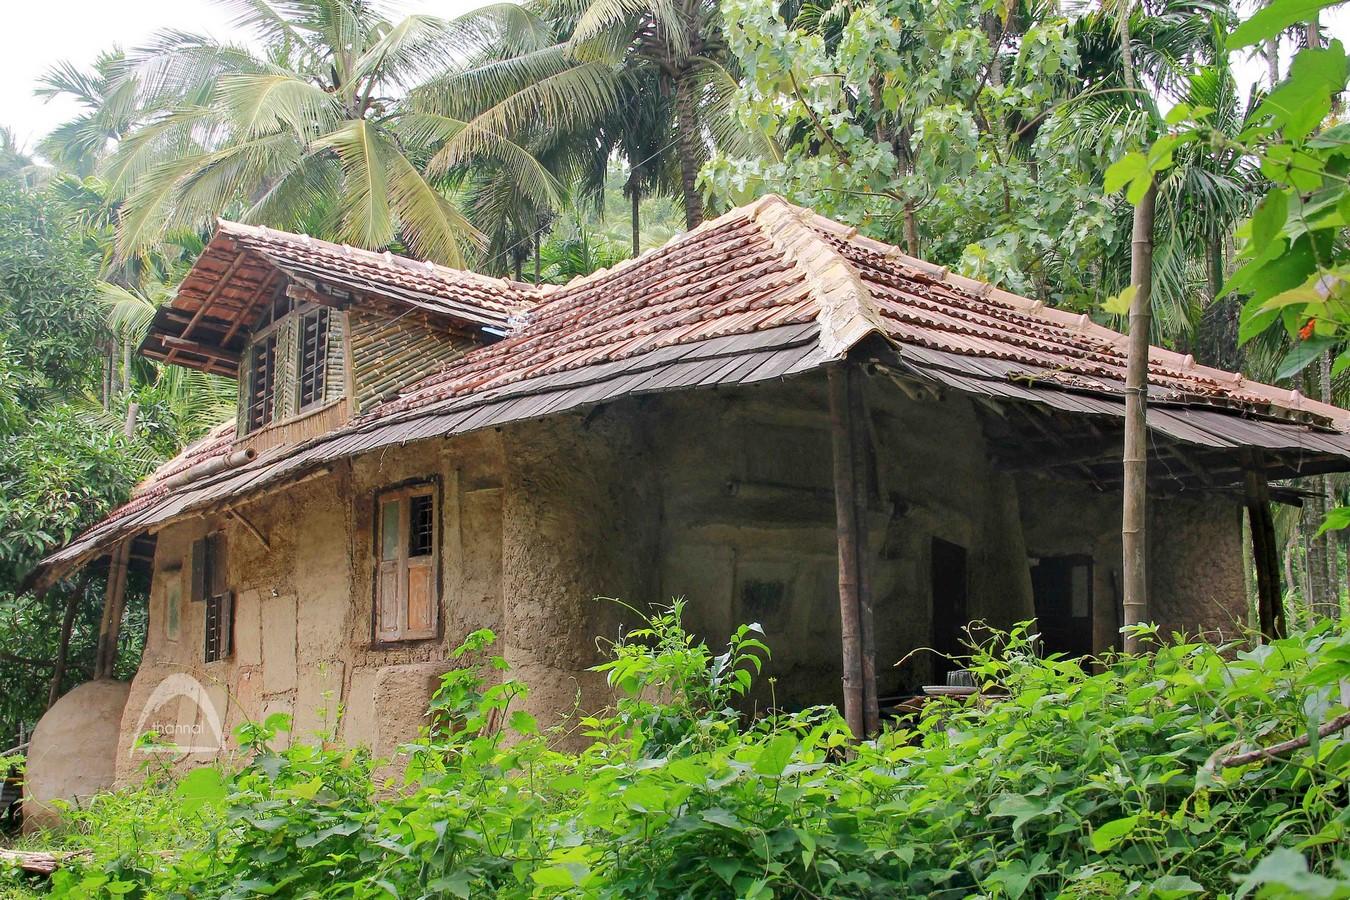 A FARMER'S HOME, ATTAPPADI, KERALA - Sheet1